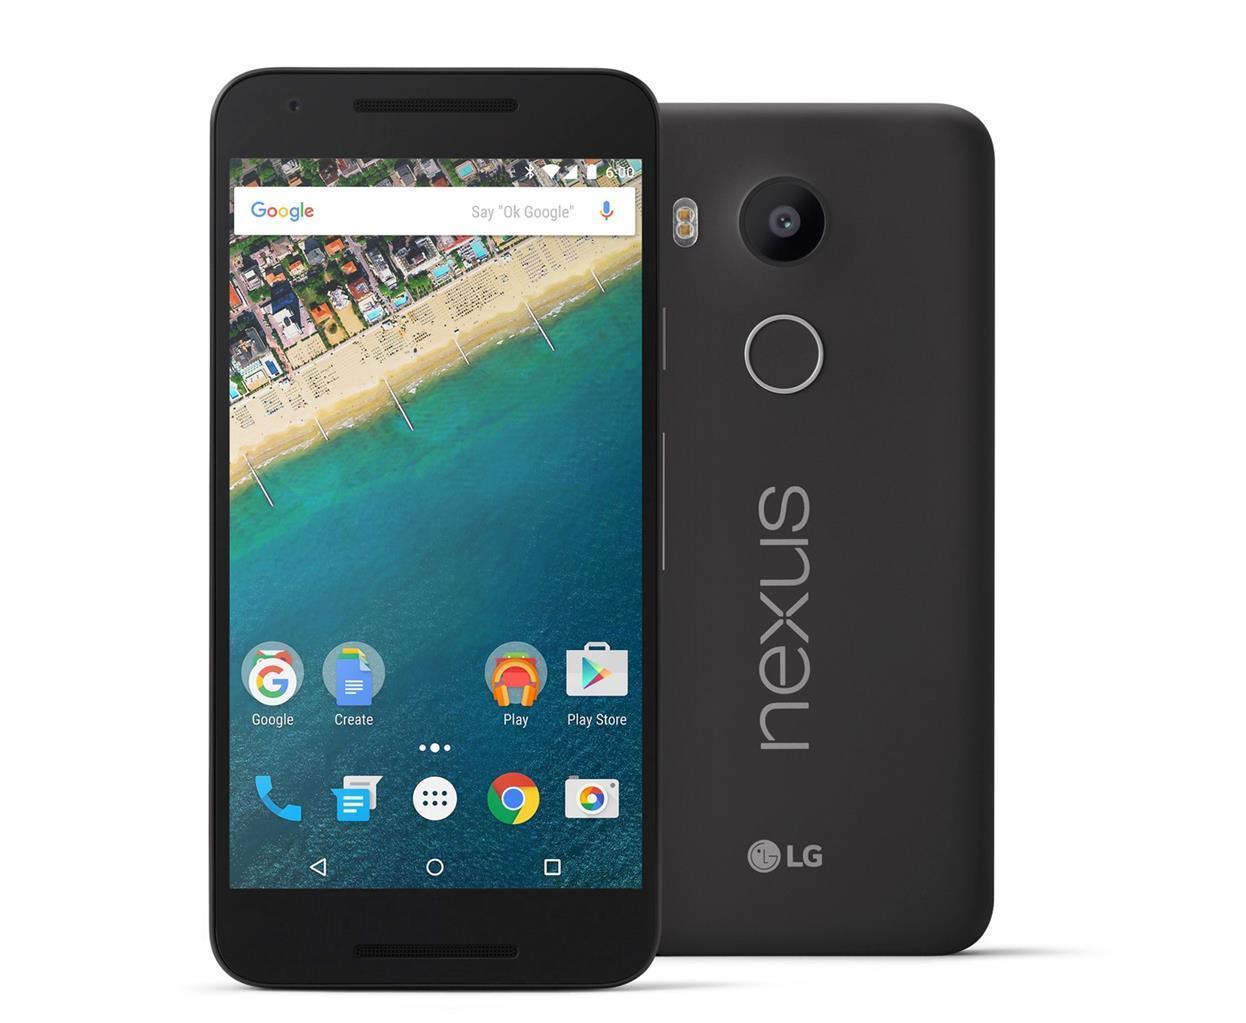 32GB LG Nexus 5X H790 4G LTE Android Unlocked Smartphone  $225 + Free Shipping